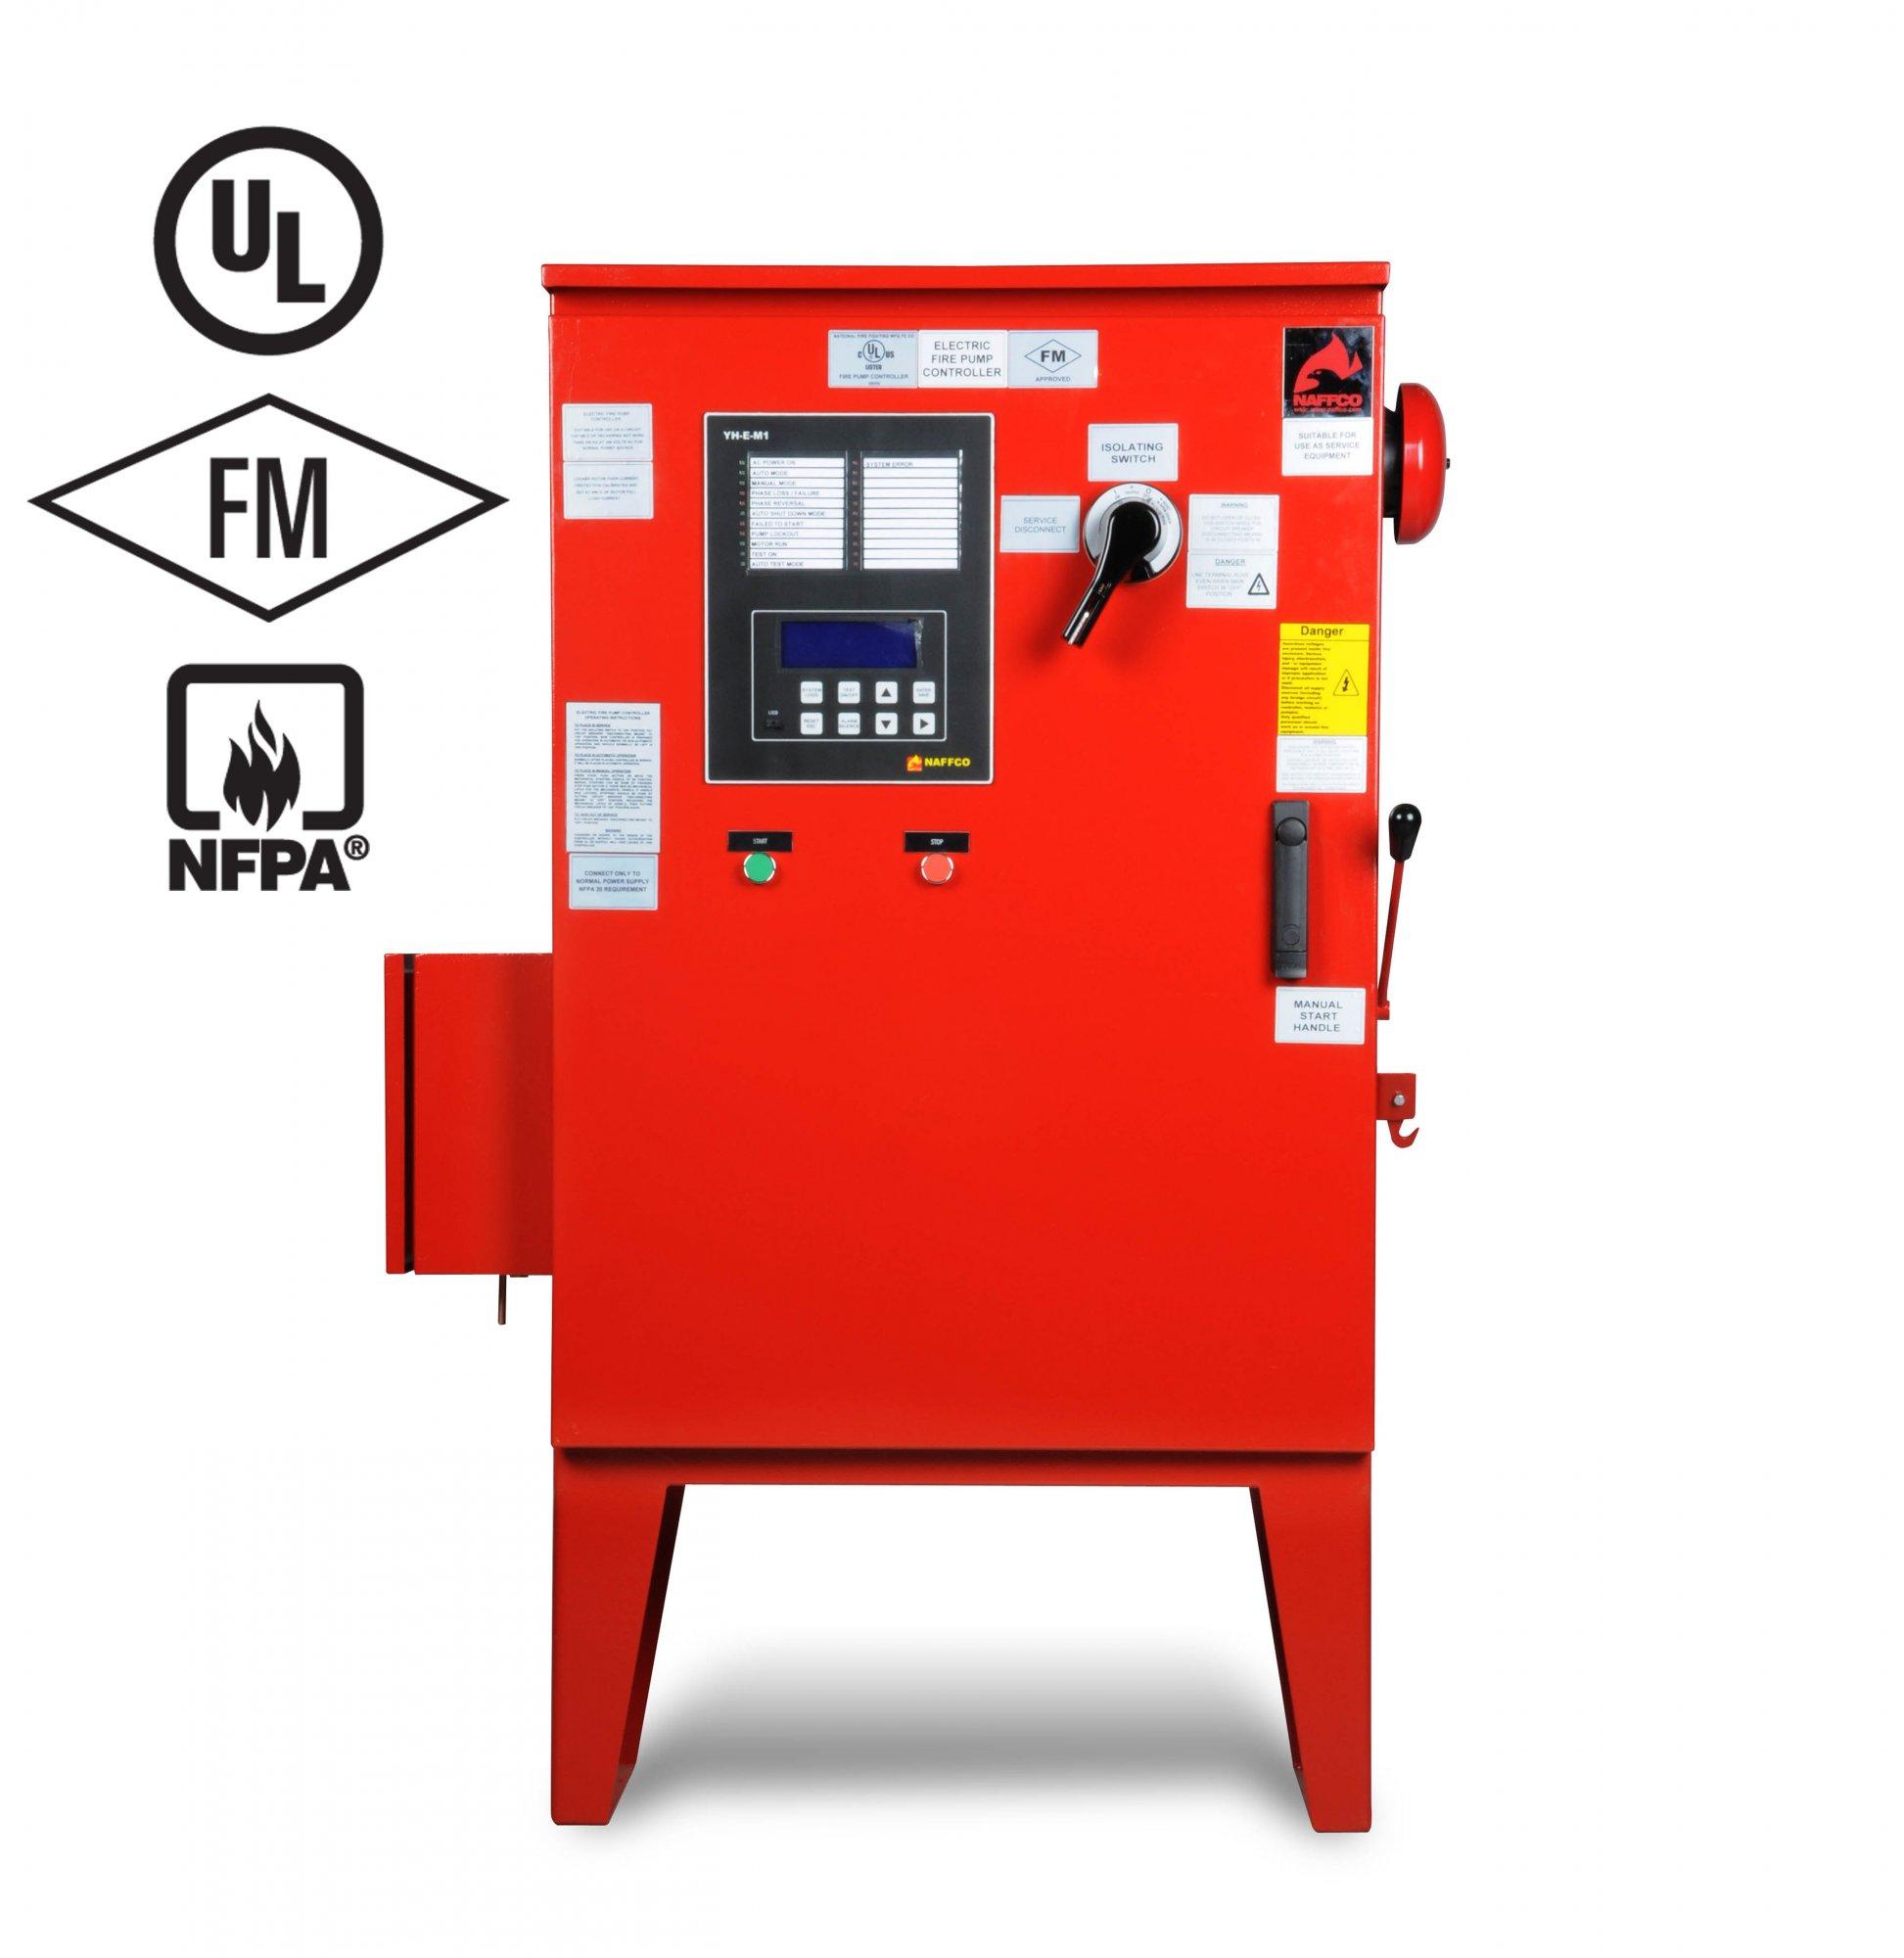 WRG-5168] Fire Pump Controller Wiring Diagram